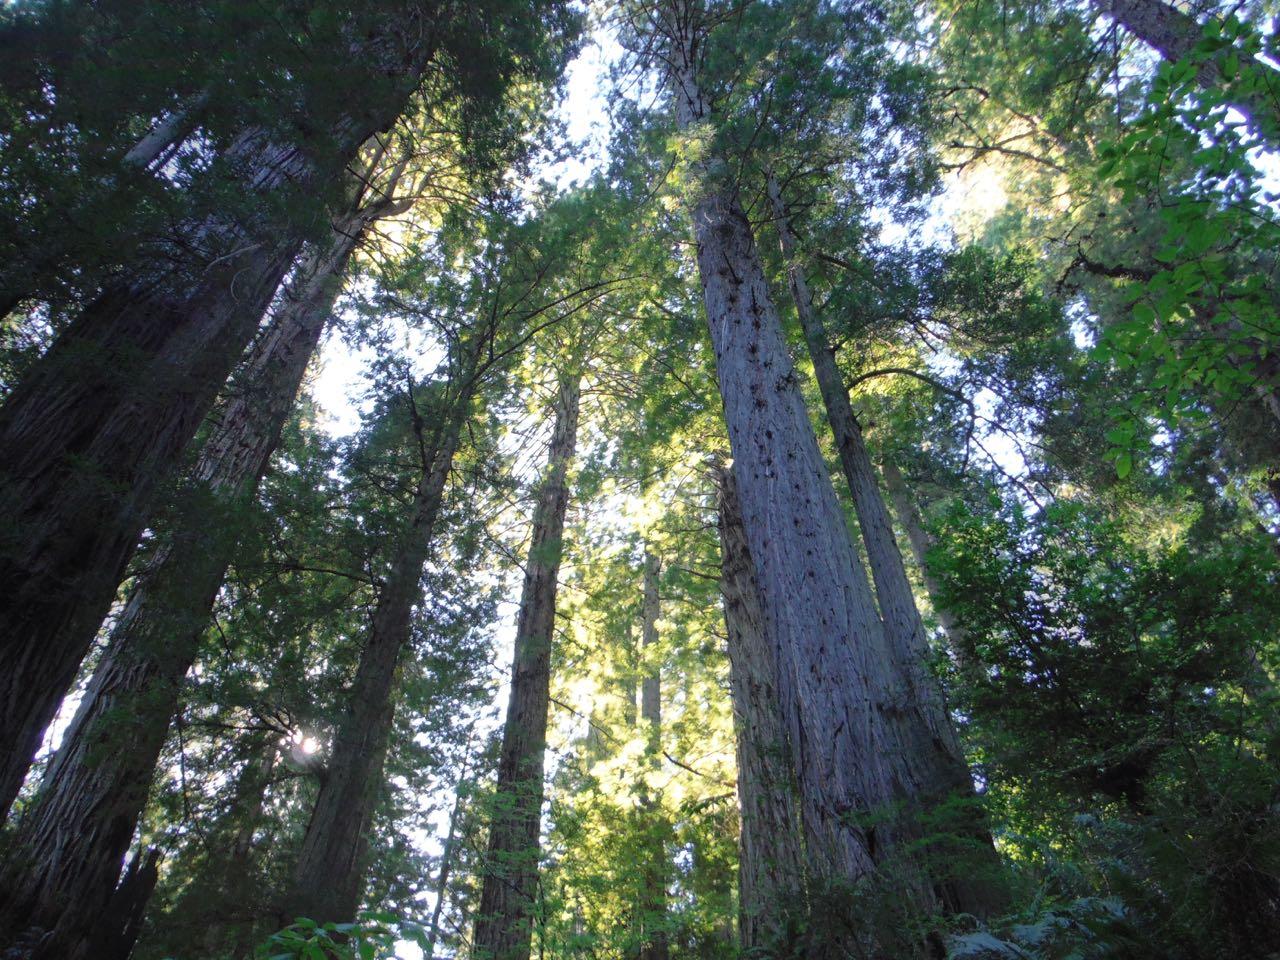 Redwoods 2017 10 01 197 Of 244